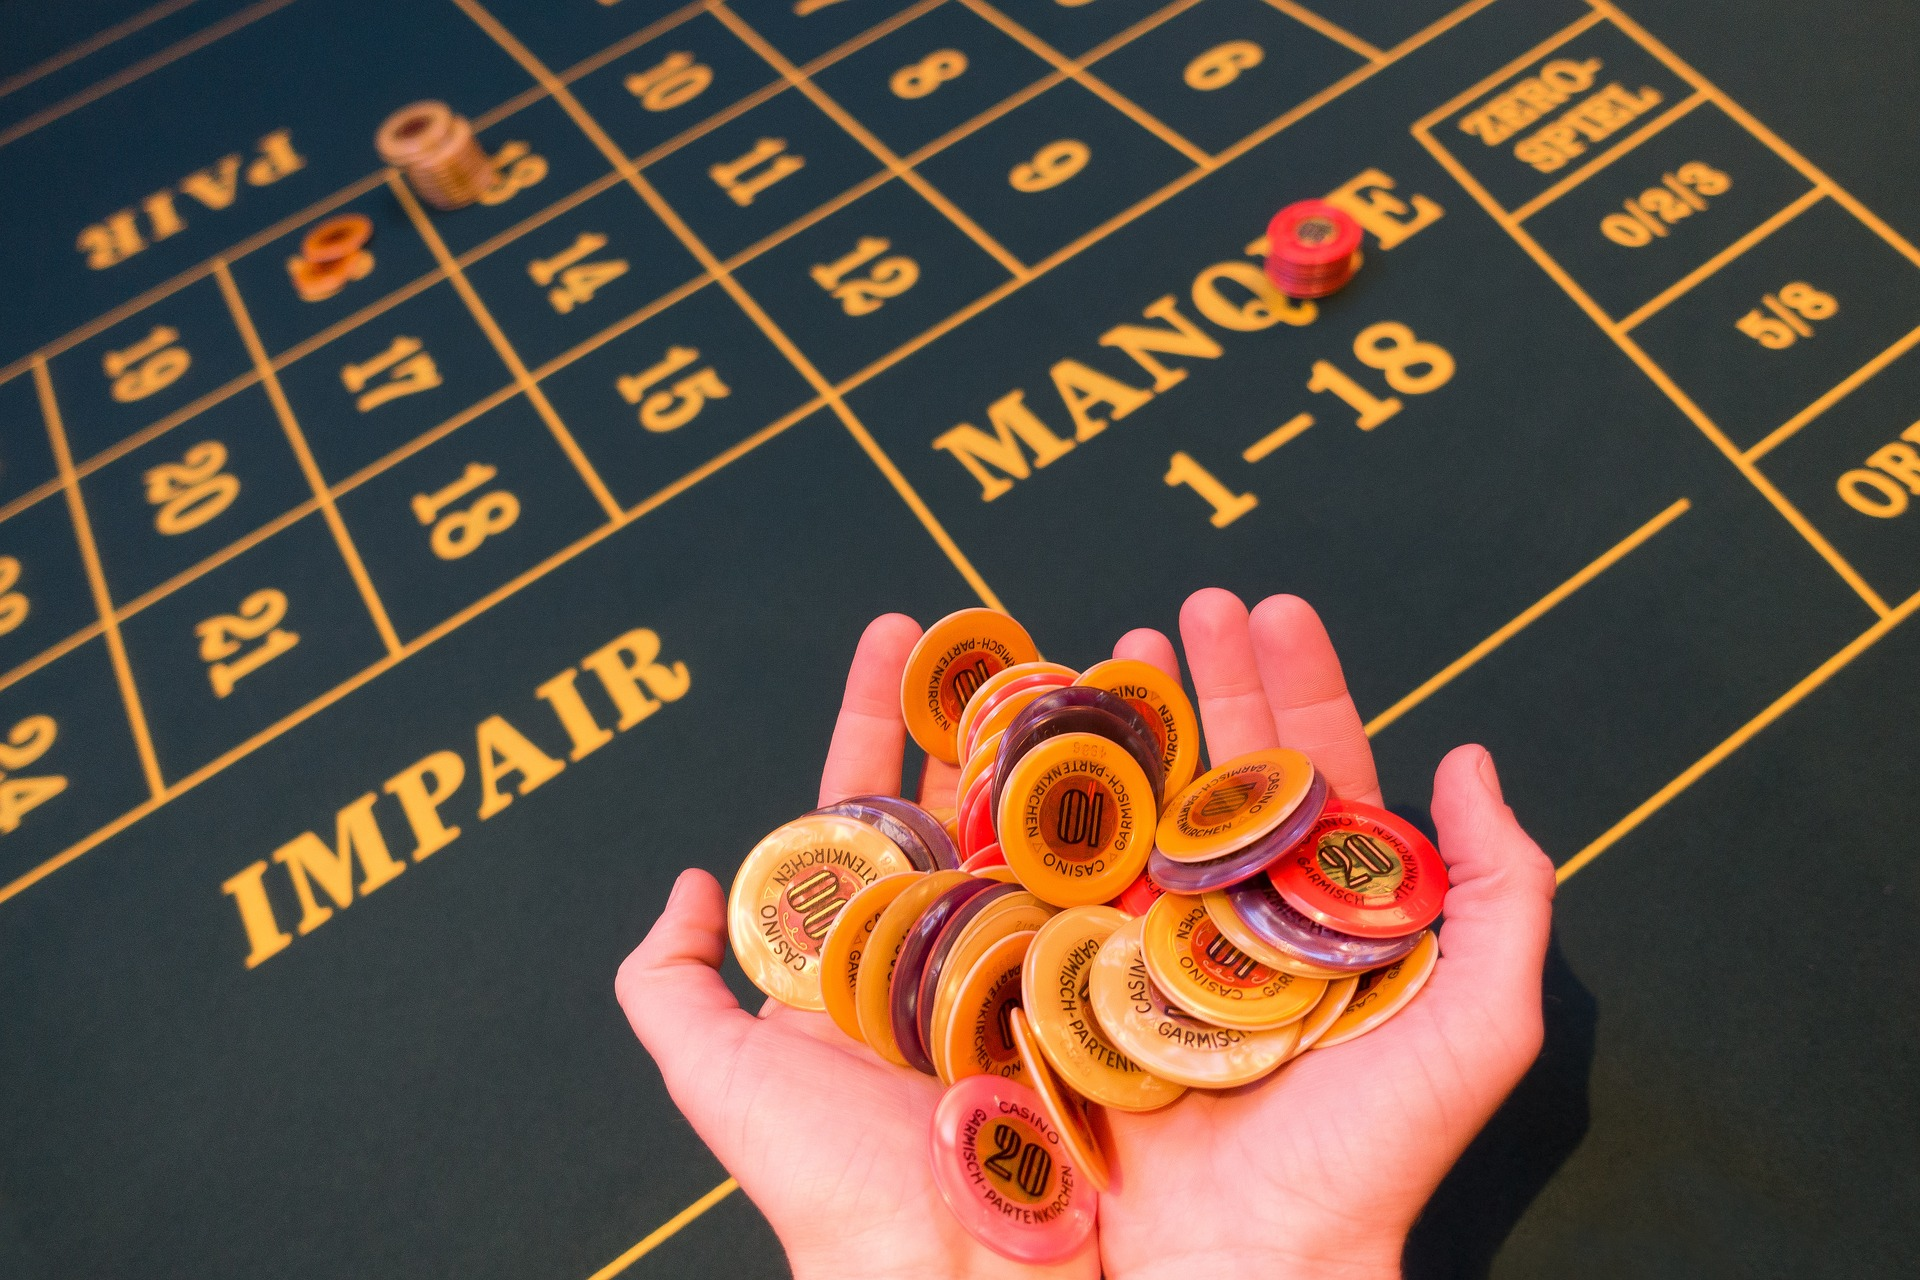 game-bank-1003148_1920